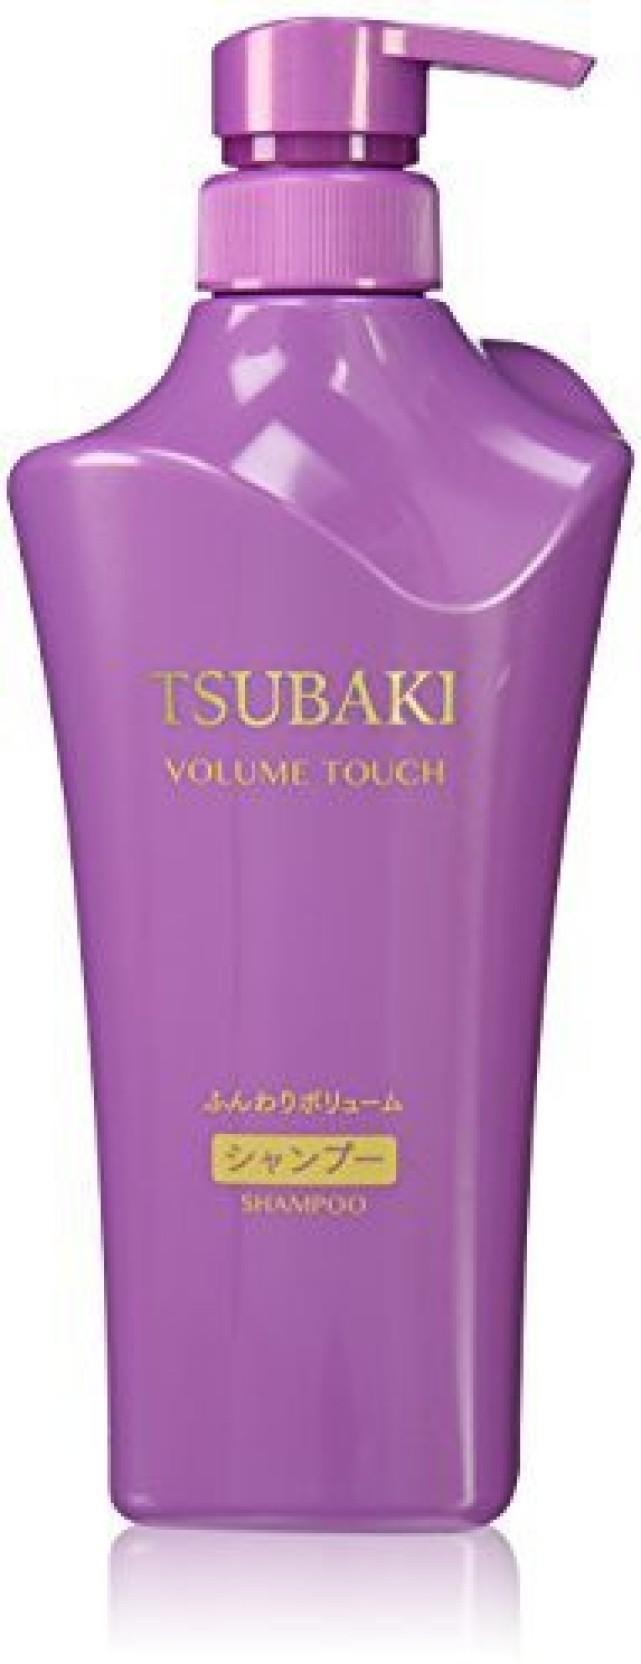 Tsubaki Shiseido Volume Touch Shampoo - Price in India, Buy